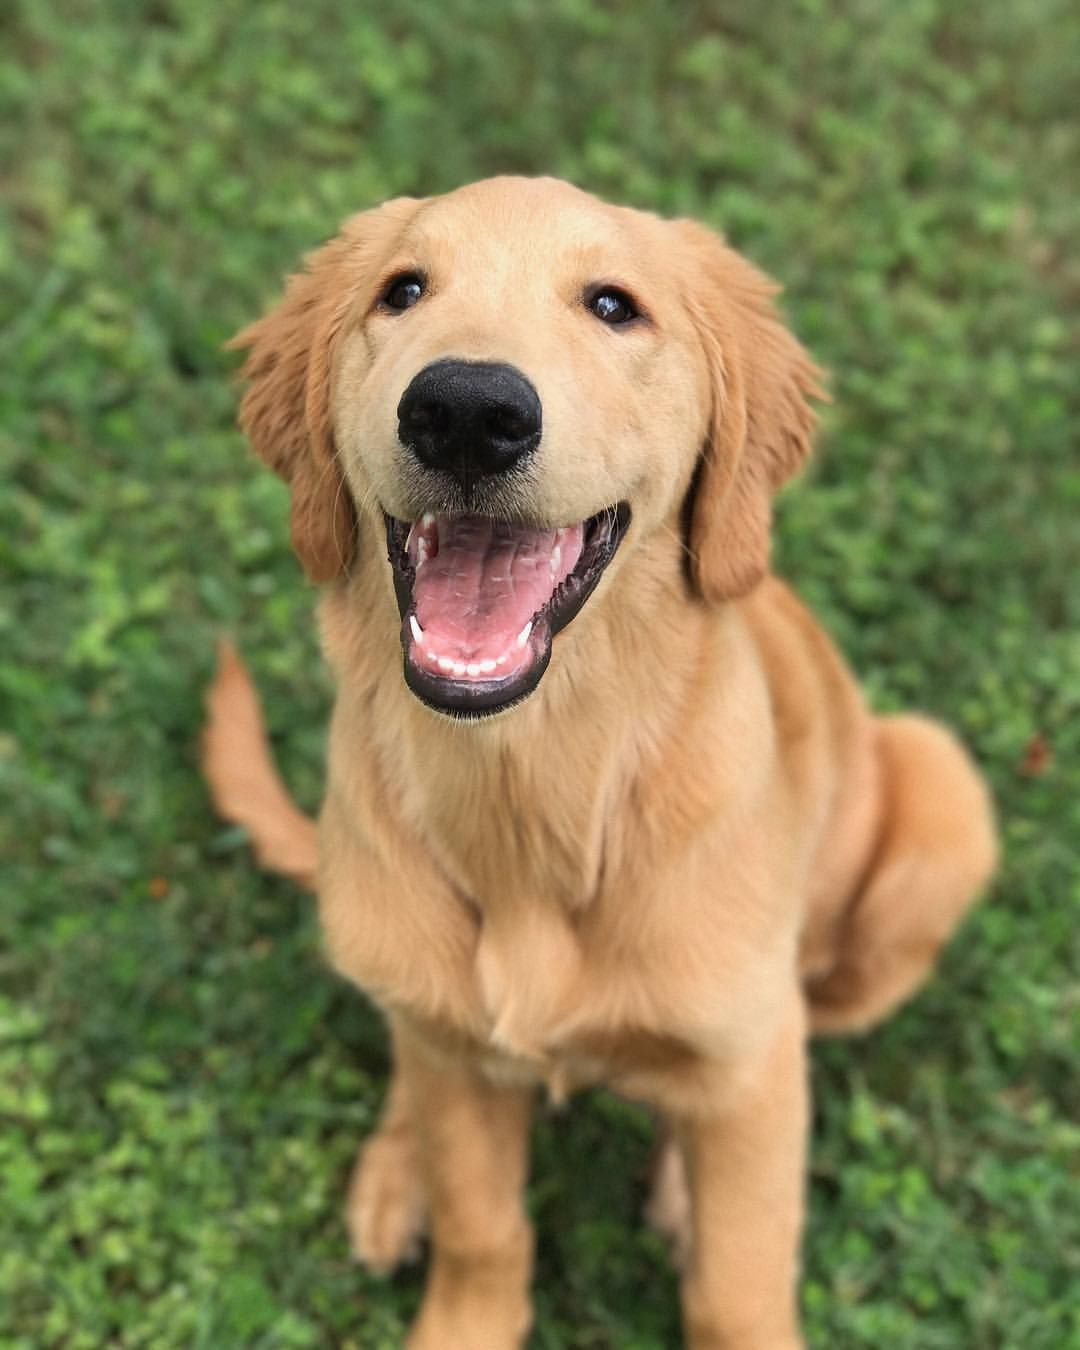 Hurley The Golden Retriever Golden Retriever Golden Retriever Puppy Golden